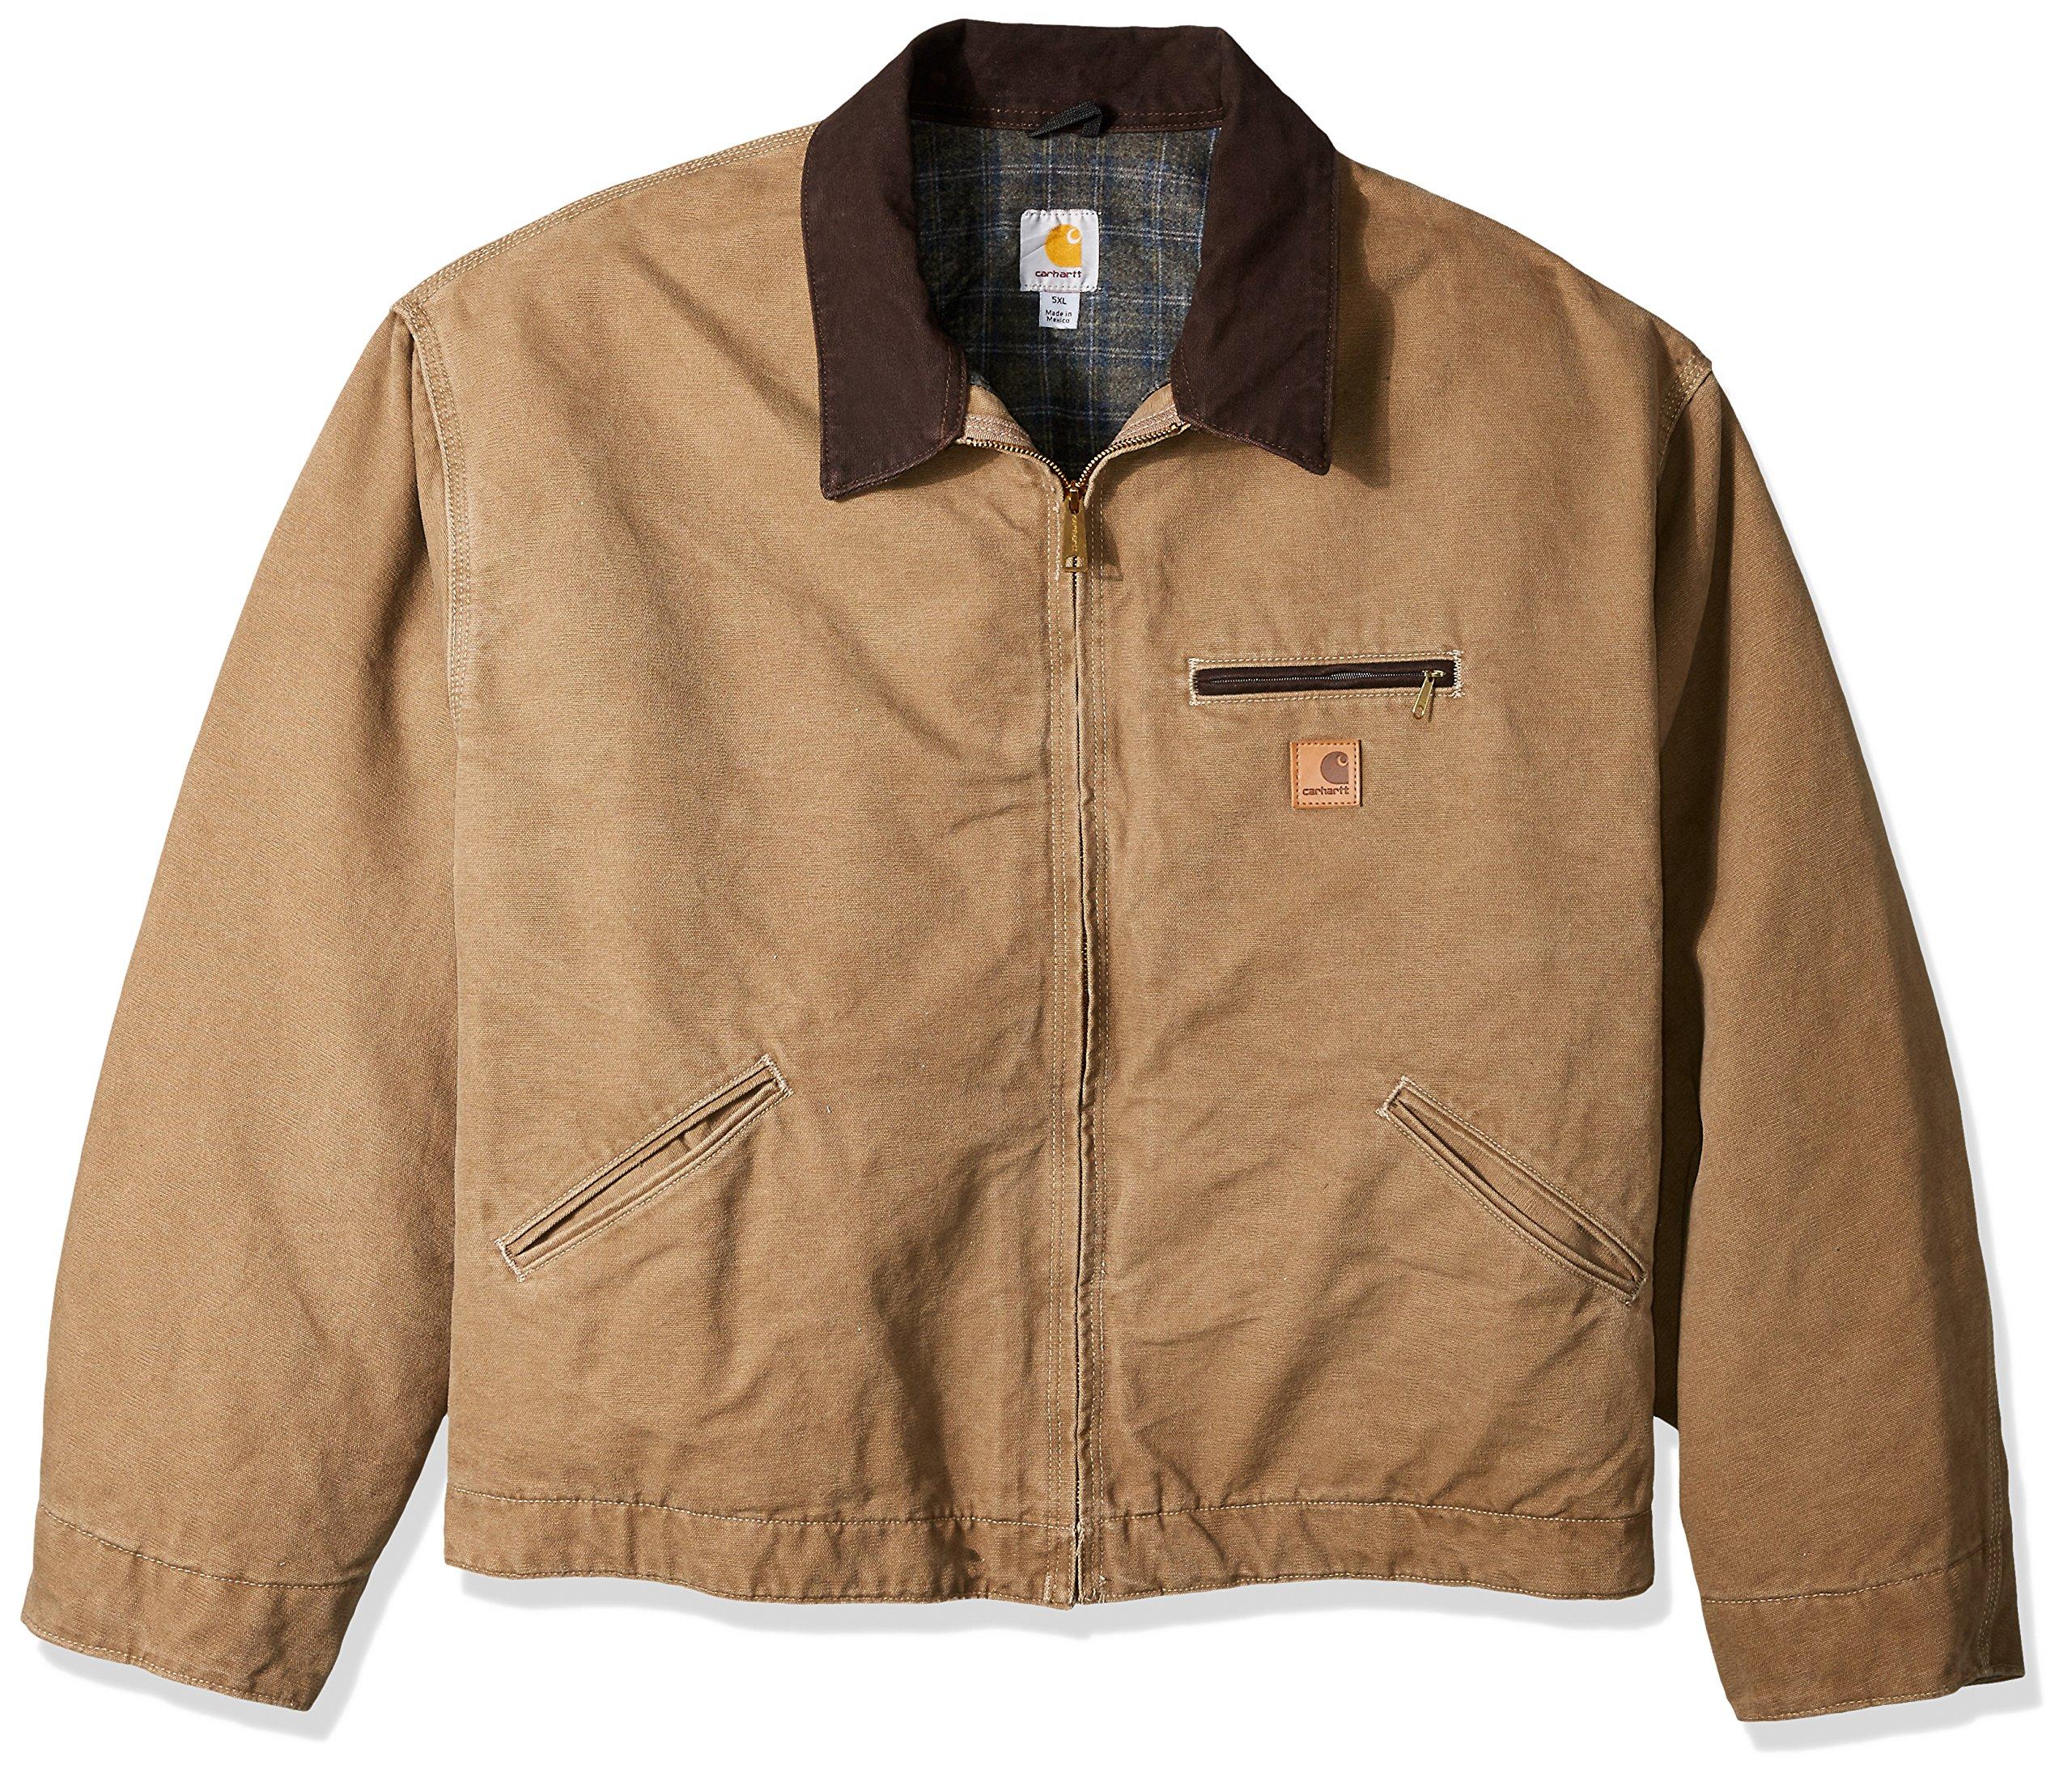 05e1b70c7 Galleon - Carhartt Men's Blanket Lined Sandstone Detroit Jacket J97 ...